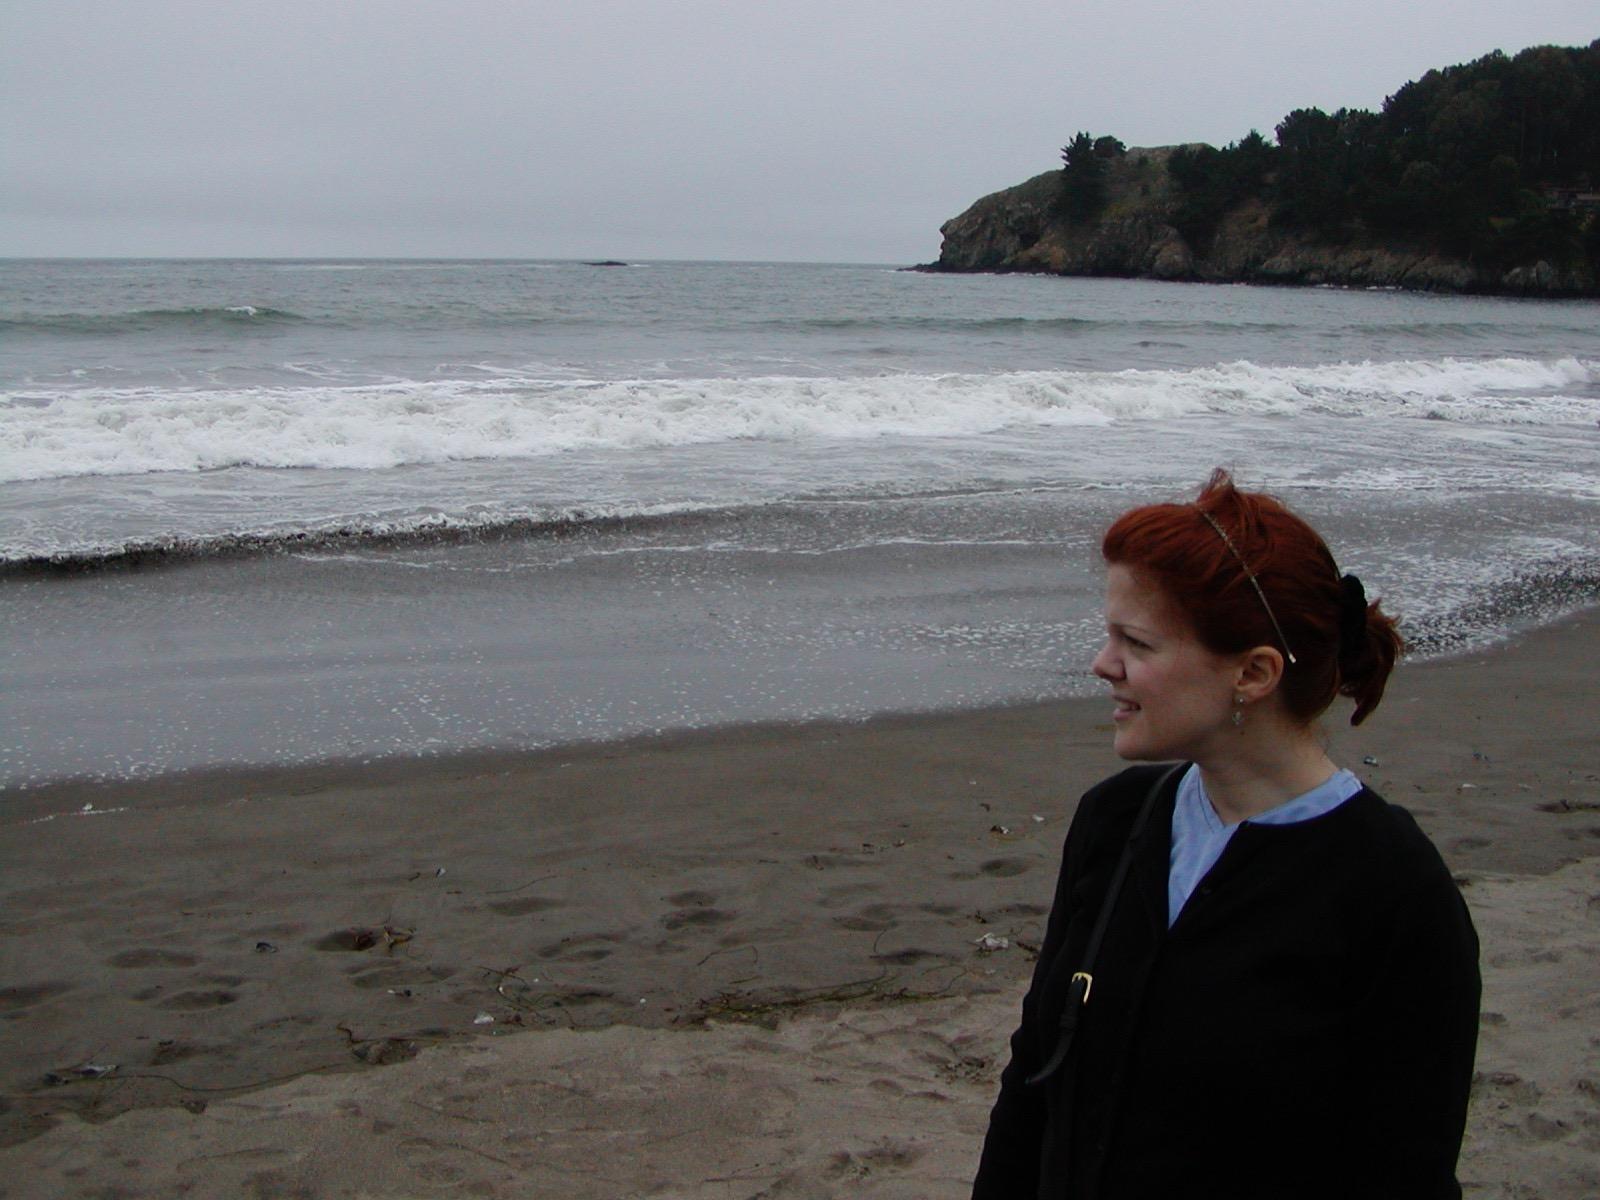 Melissa at Muir Beach near San Francisco, circa July 2005